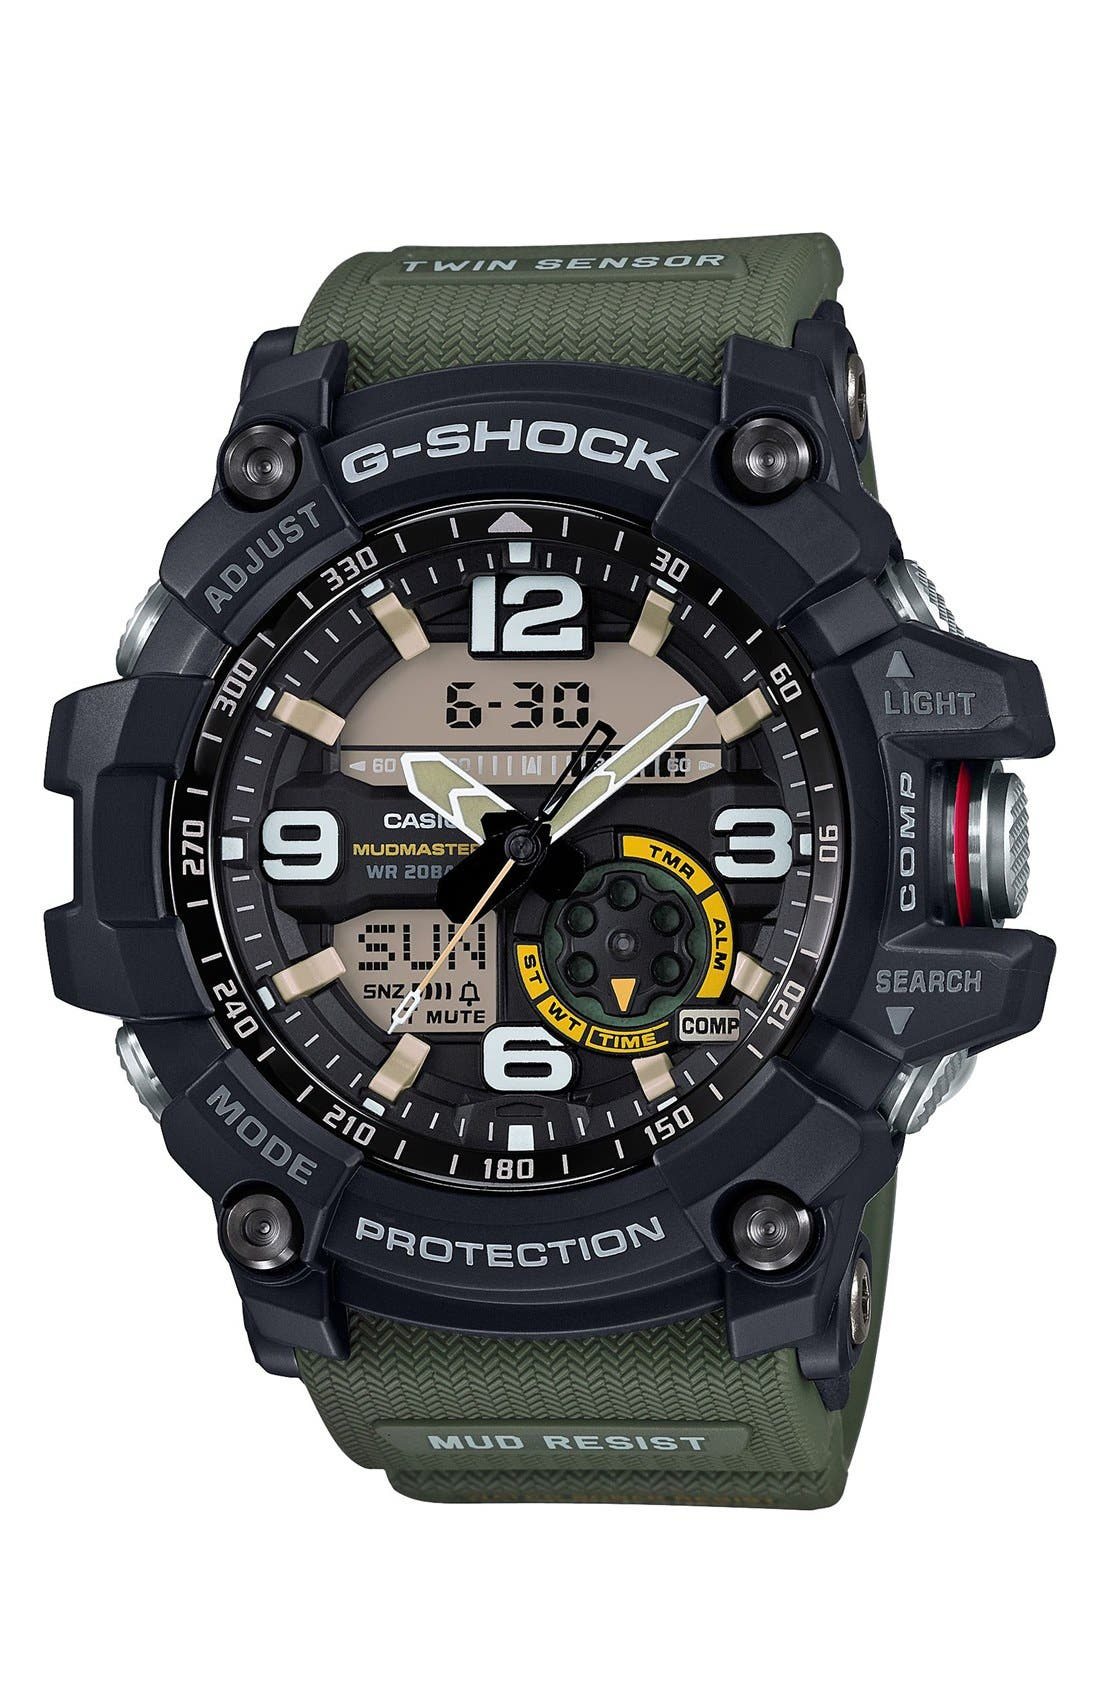 G-Shock 'Mudmaster' Ana-Digi Watch